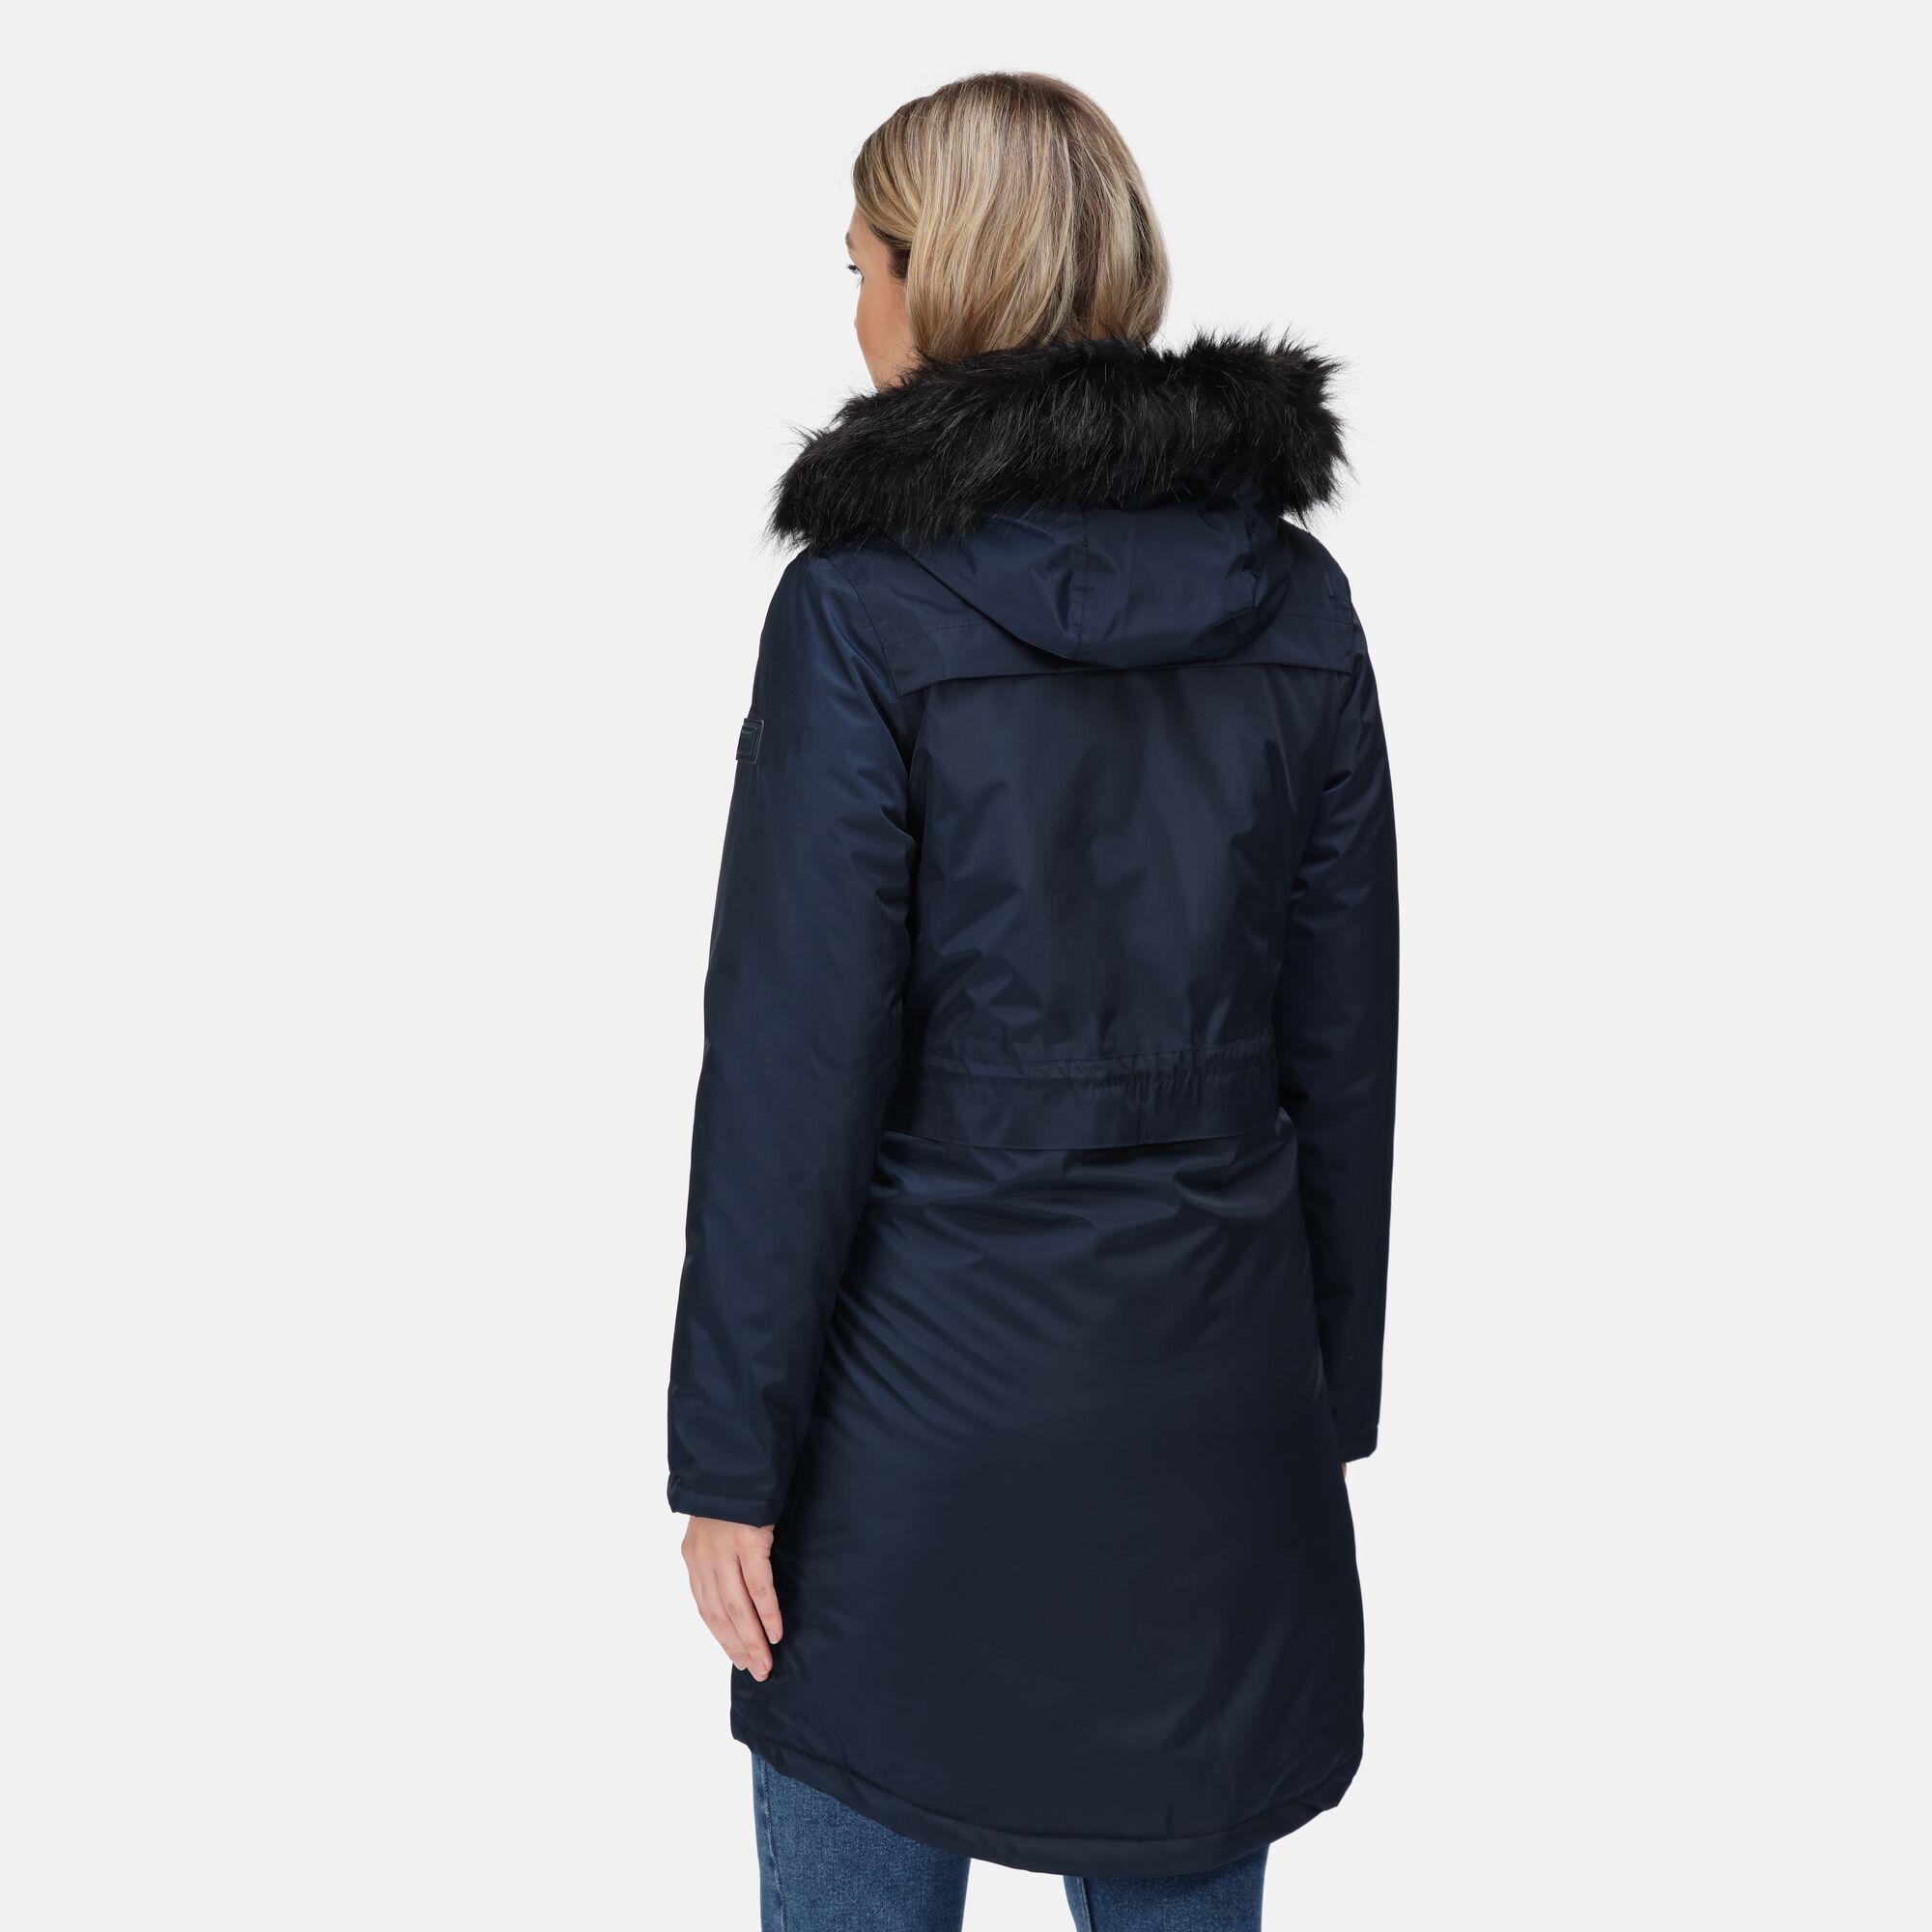 Regatta-Womens-Lexis-Waterproof-Insulated-Fur-Trim-Hood-Parka-Jacket-Blue-Navy thumbnail 8